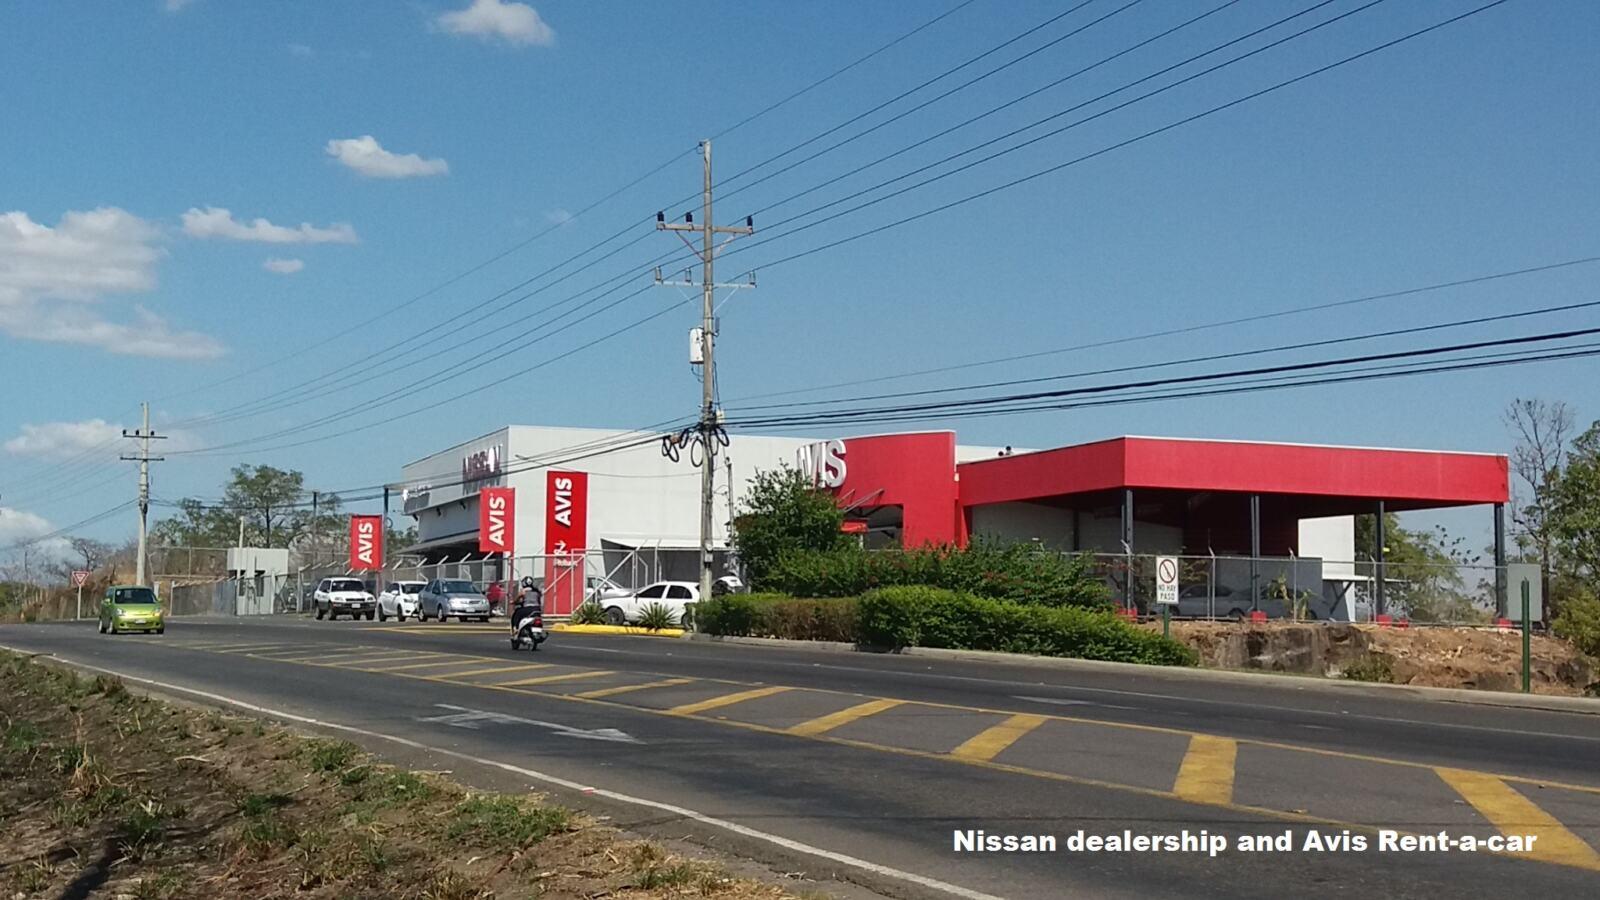 Agencia Nissan